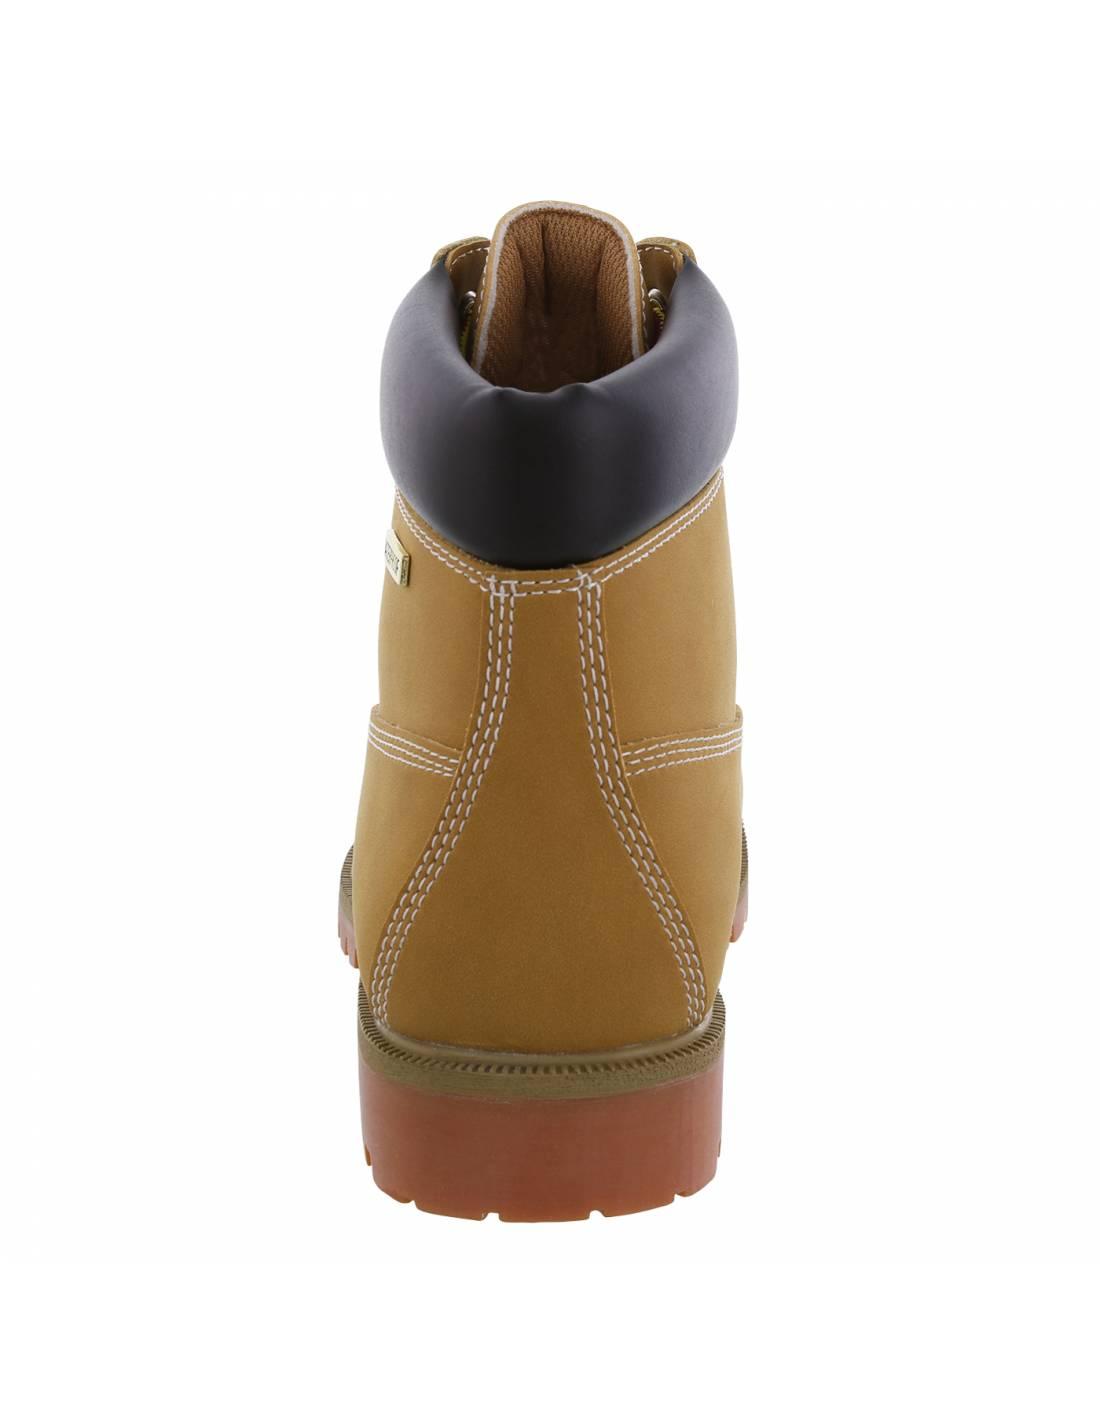 Men's Waterproof Cheyenne Boots | Payless